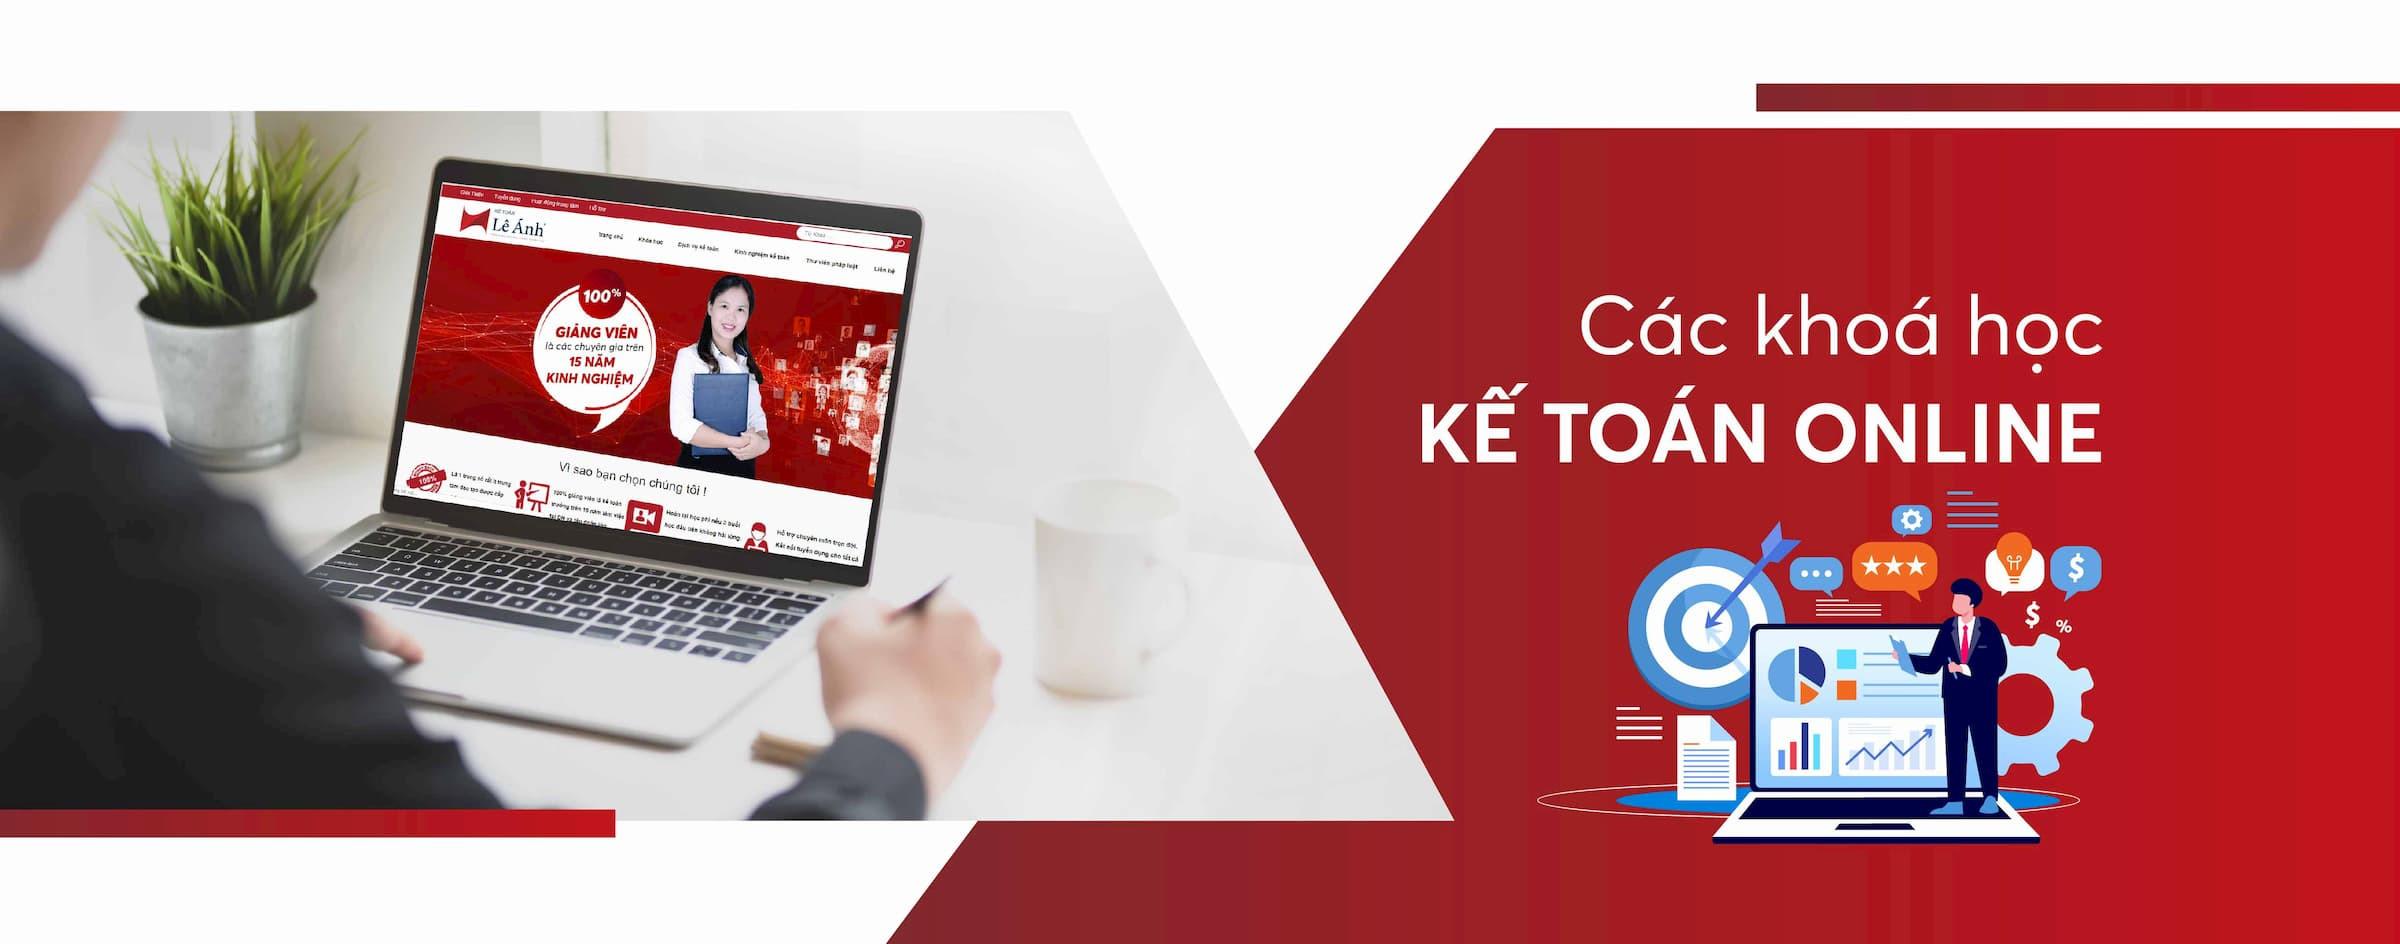 cac-khoa-hoc-ke-toan-online-1